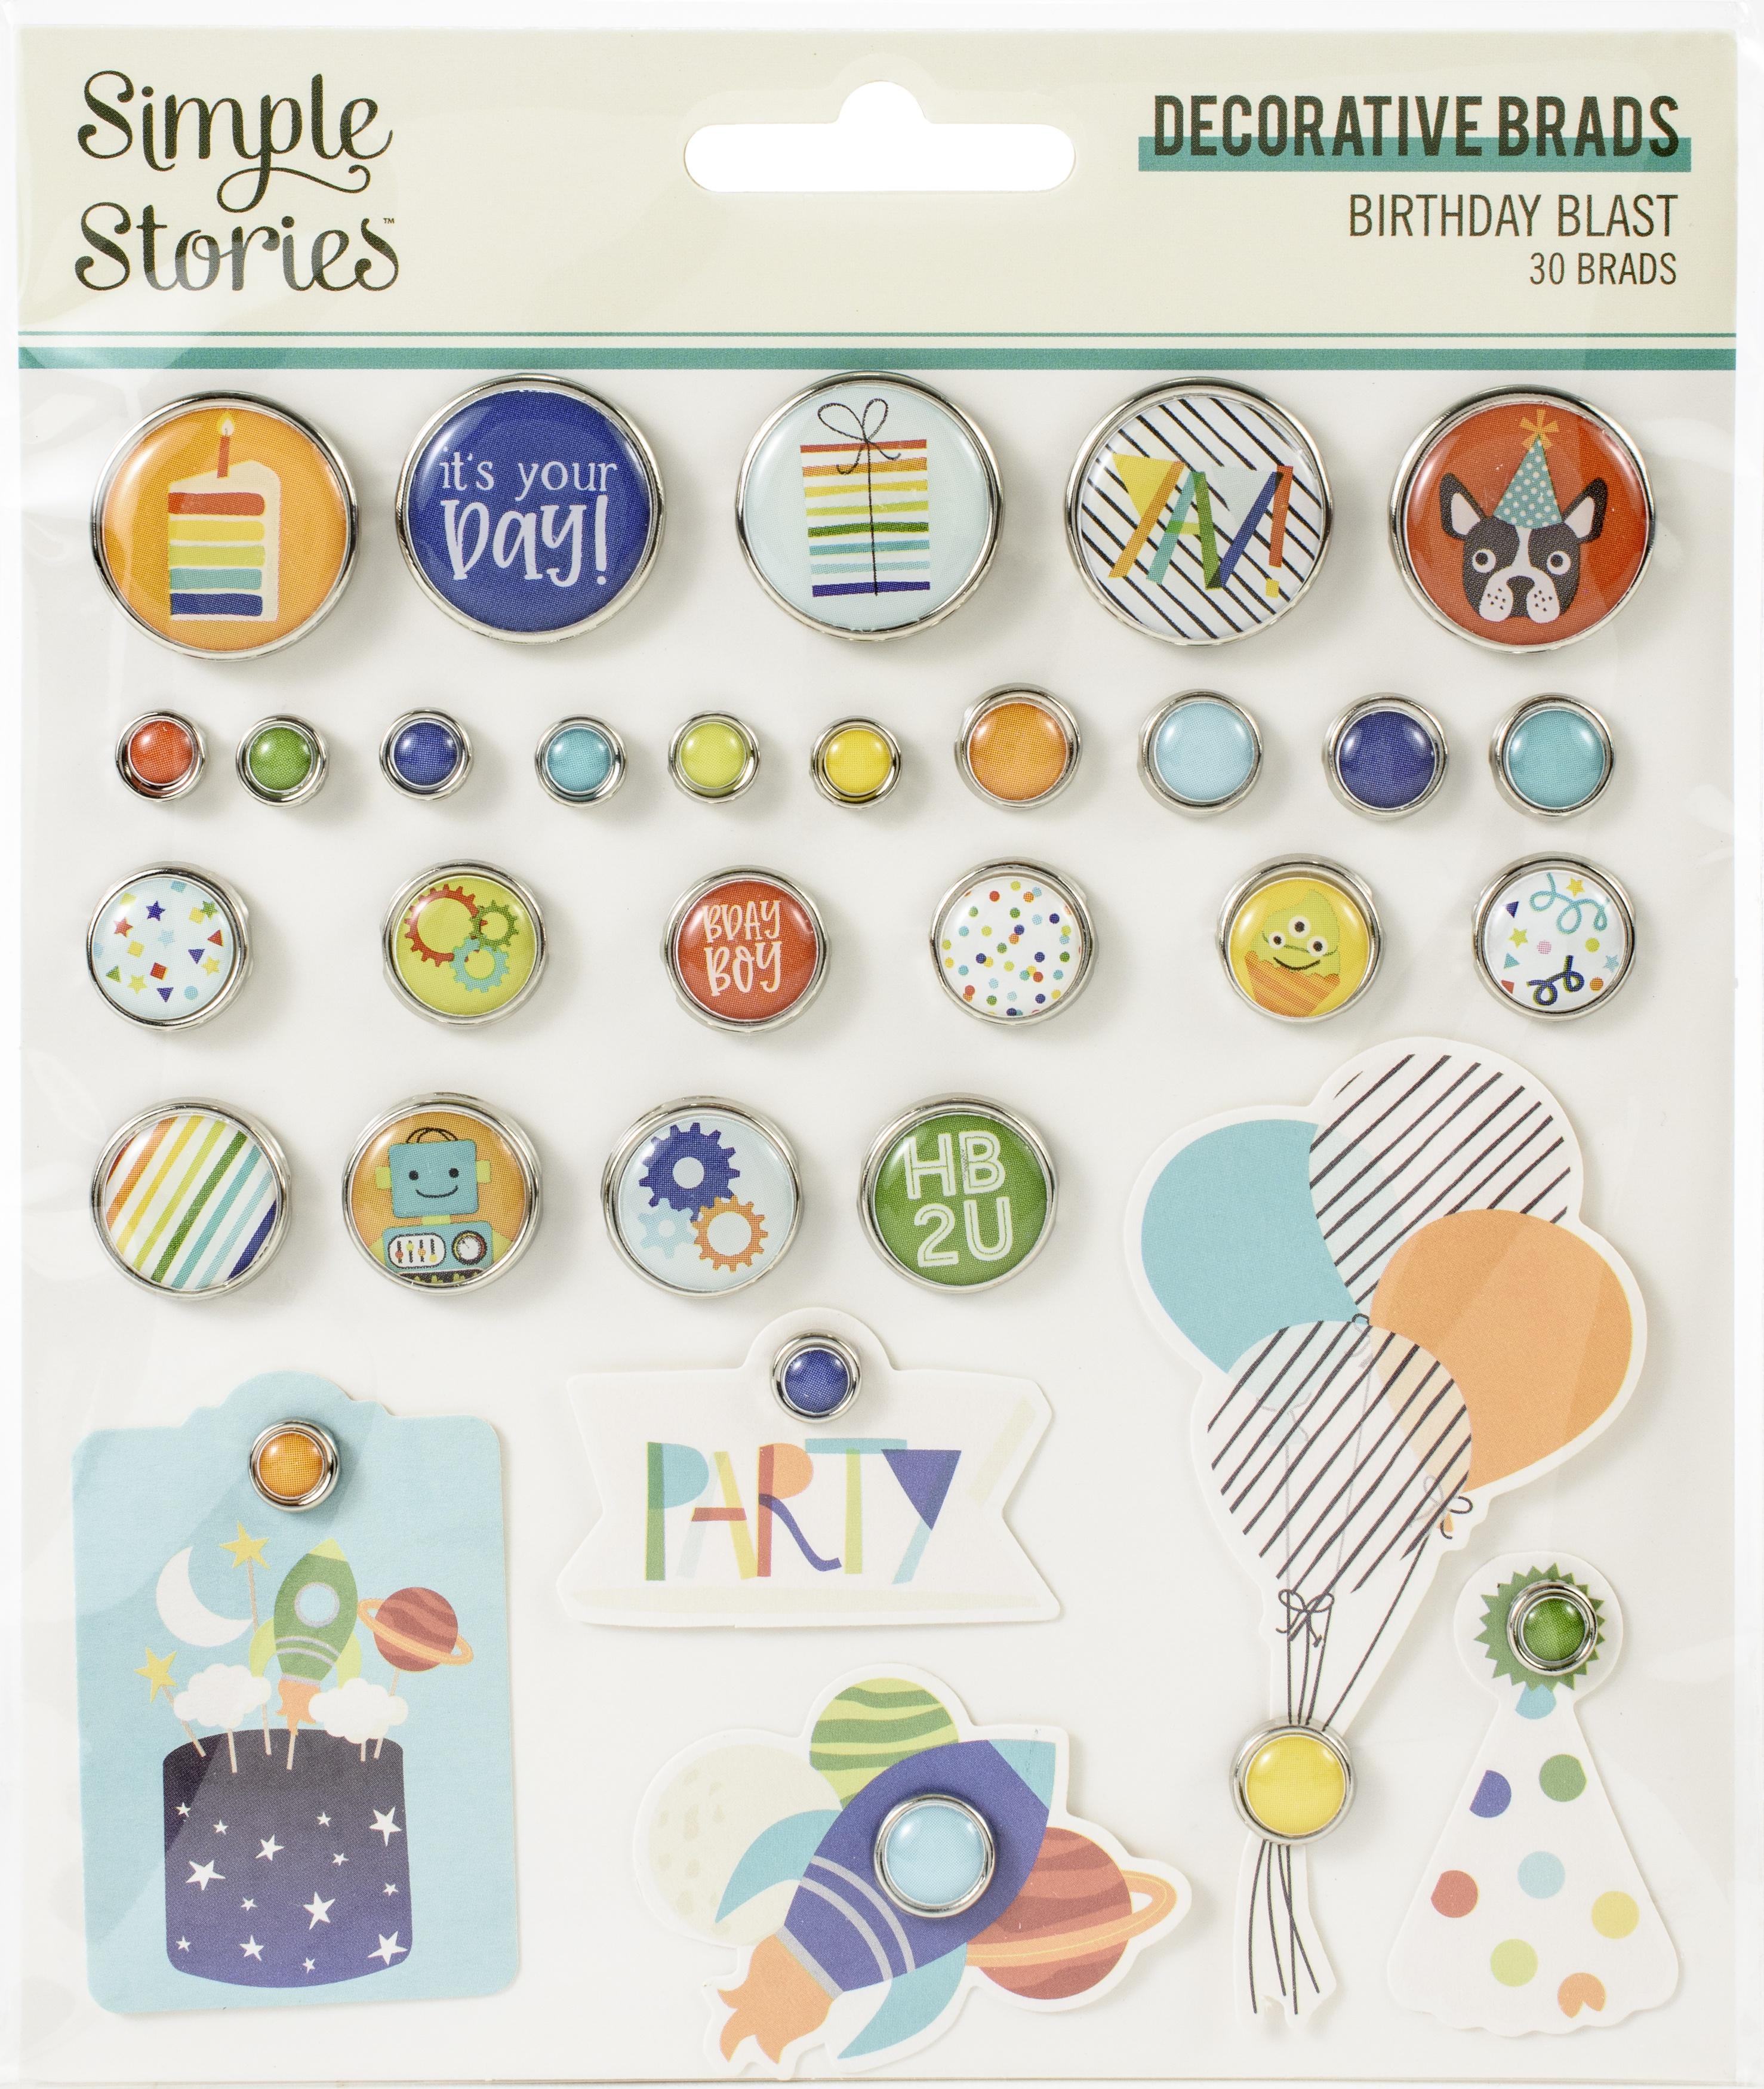 Birthday Blast Decorative Brads